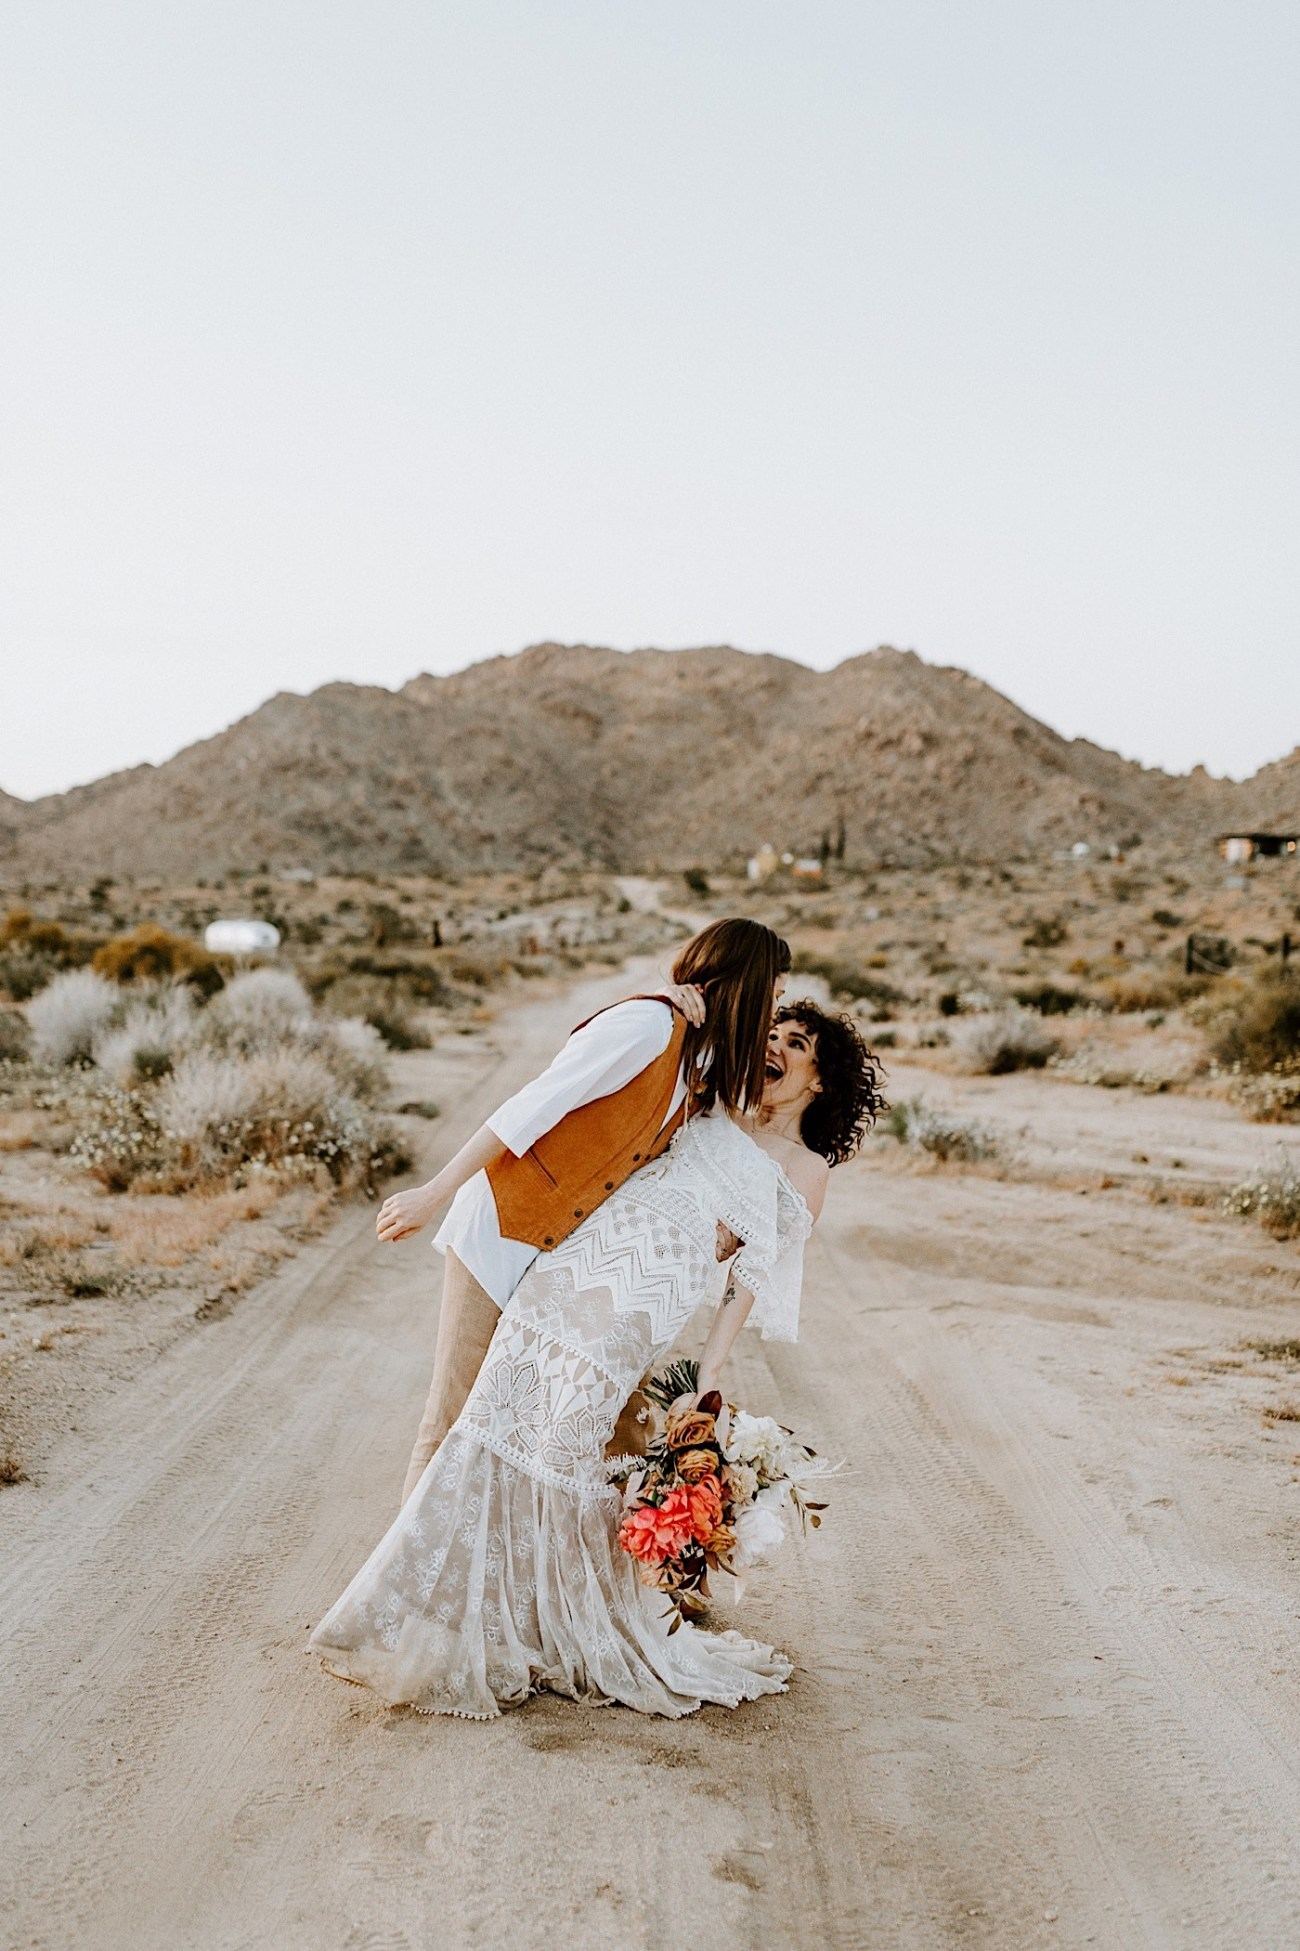 Wedding in Joshua Tree, Joshua Tree Wedding Photographer, Palm Springs Wedding Photographer